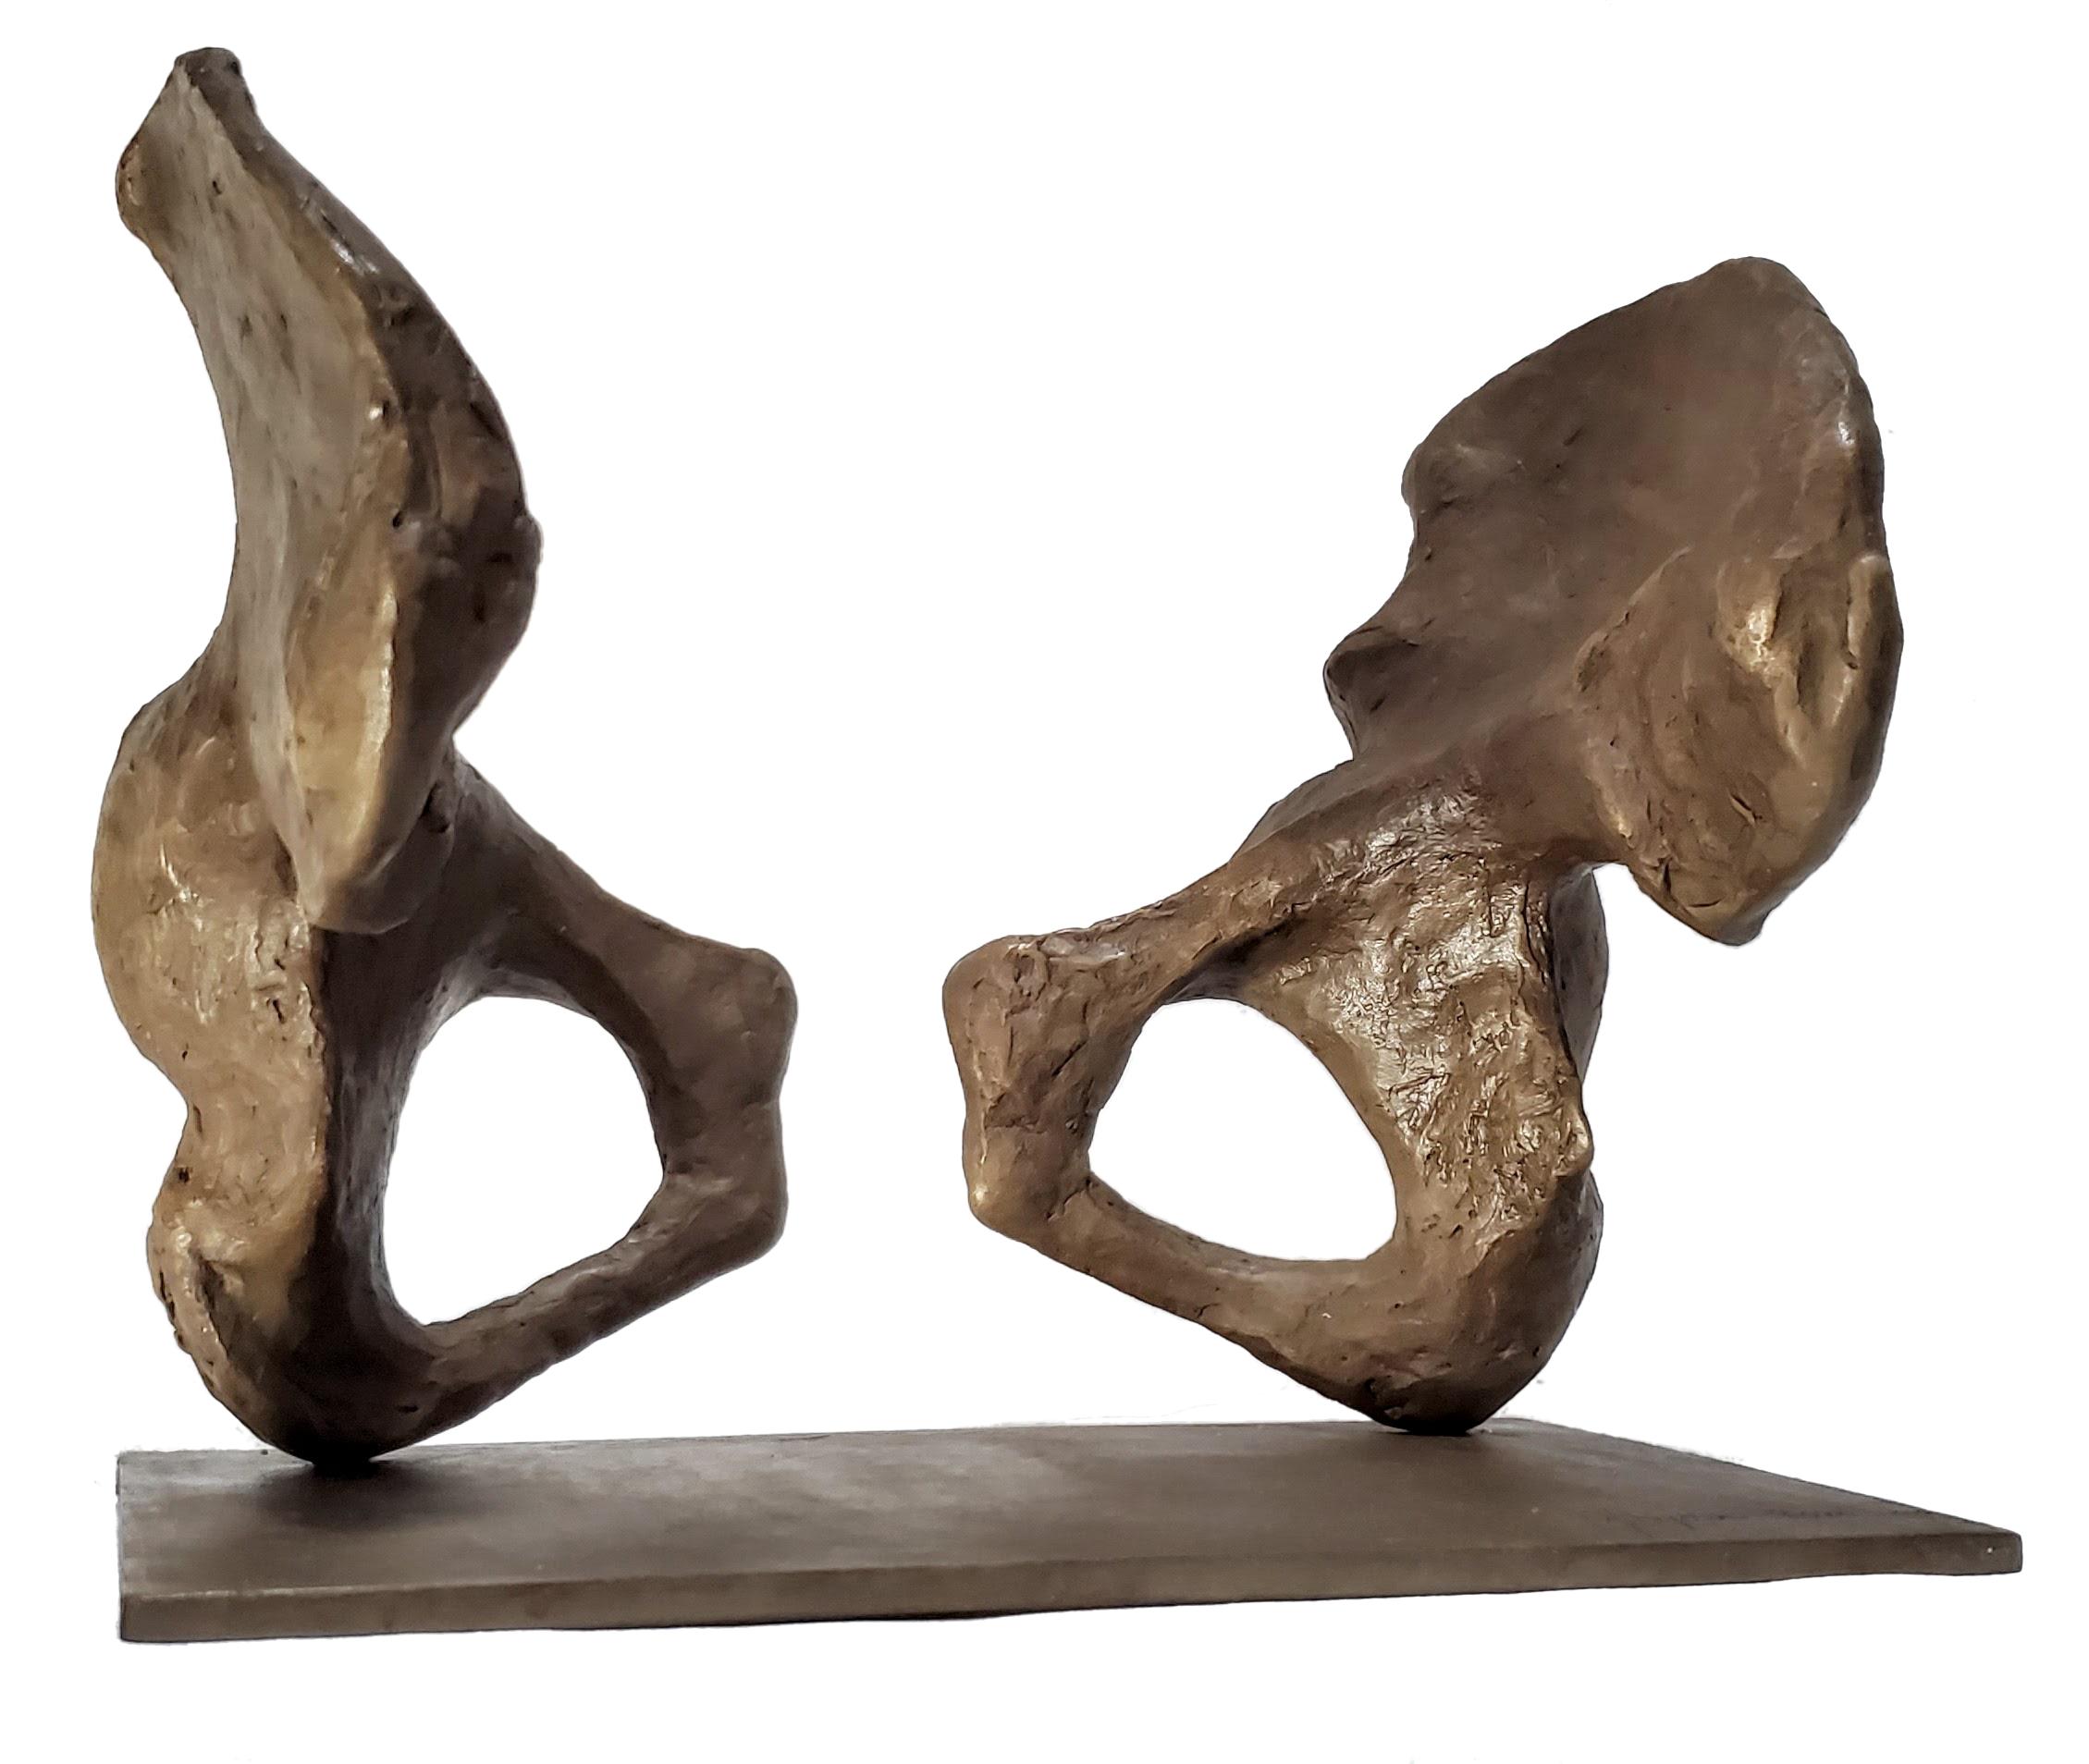 anatomy bronze sculpture human pelvis bone skeleton brown patina